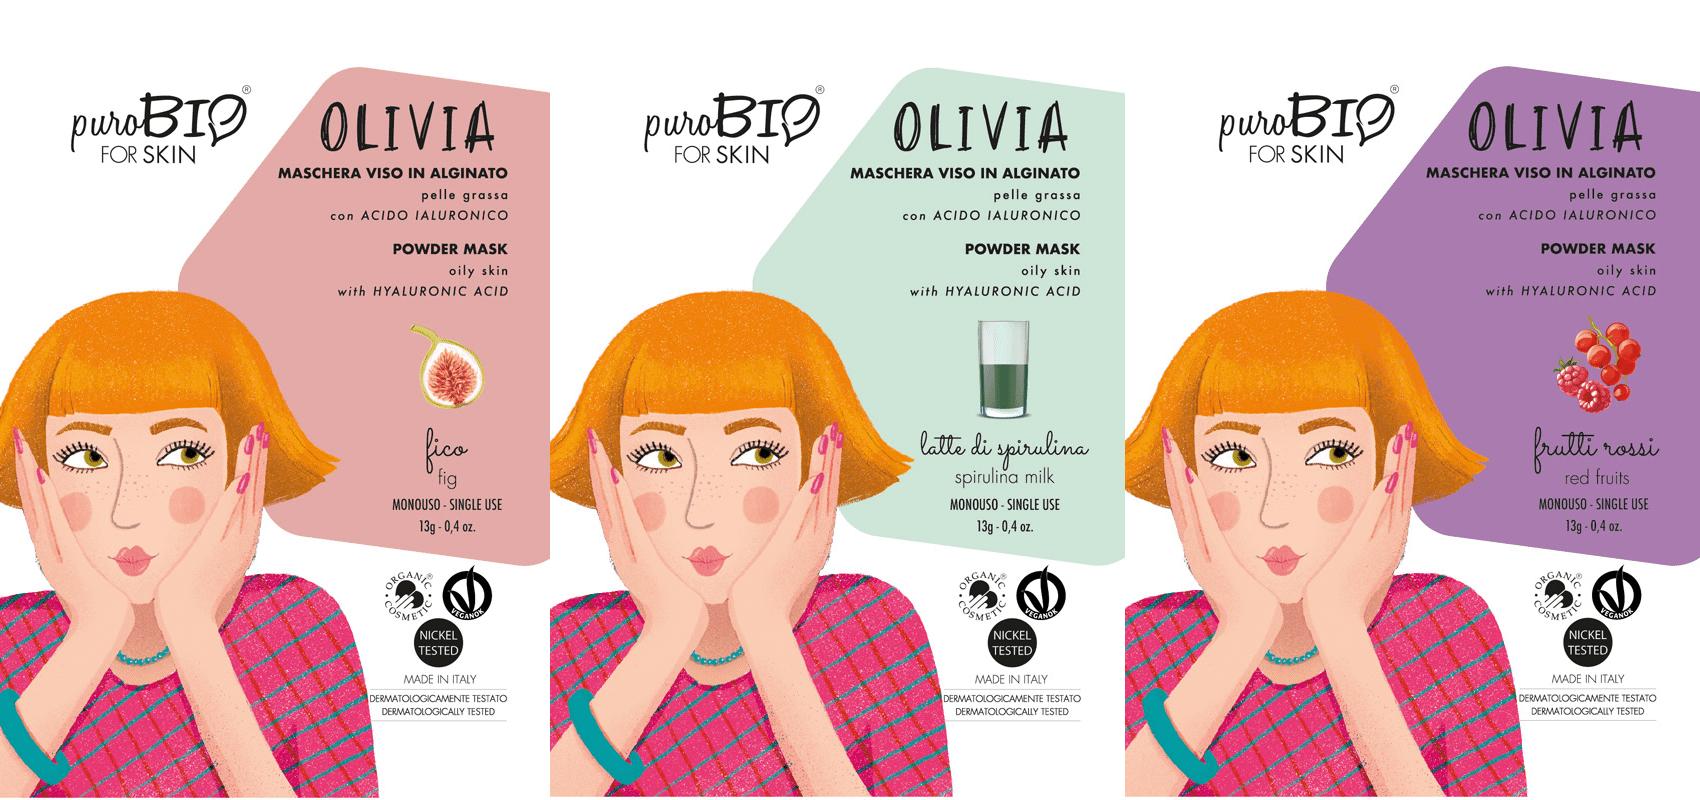 Mascarilla facial Olivia Purobio For Skin